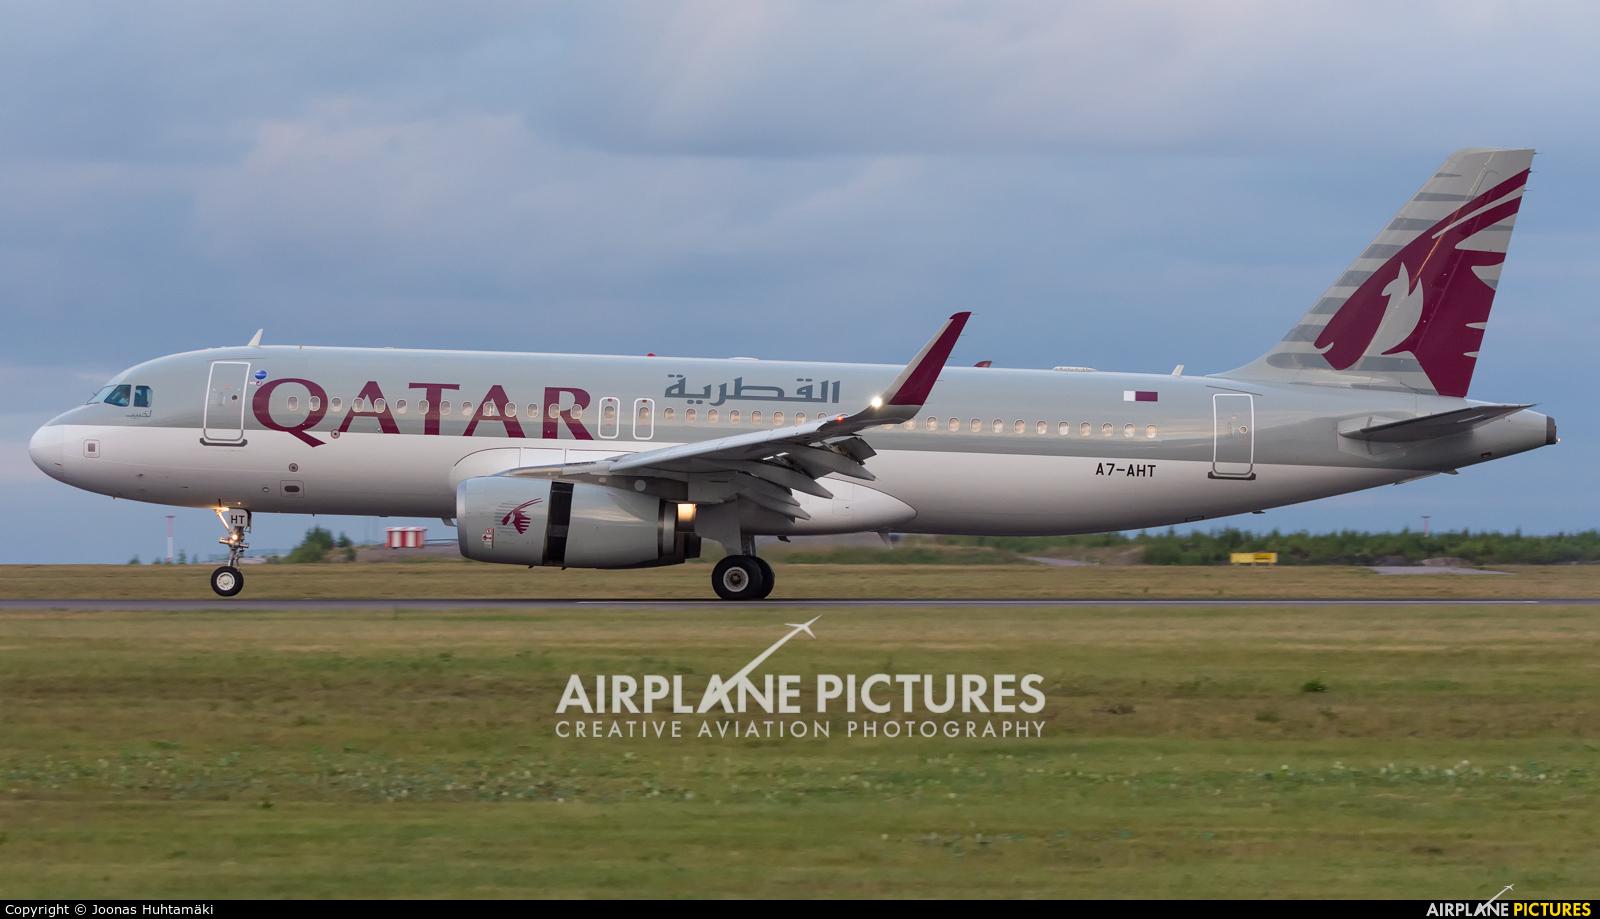 Qatar Airways A7-AHT aircraft at Helsinki - Vantaa